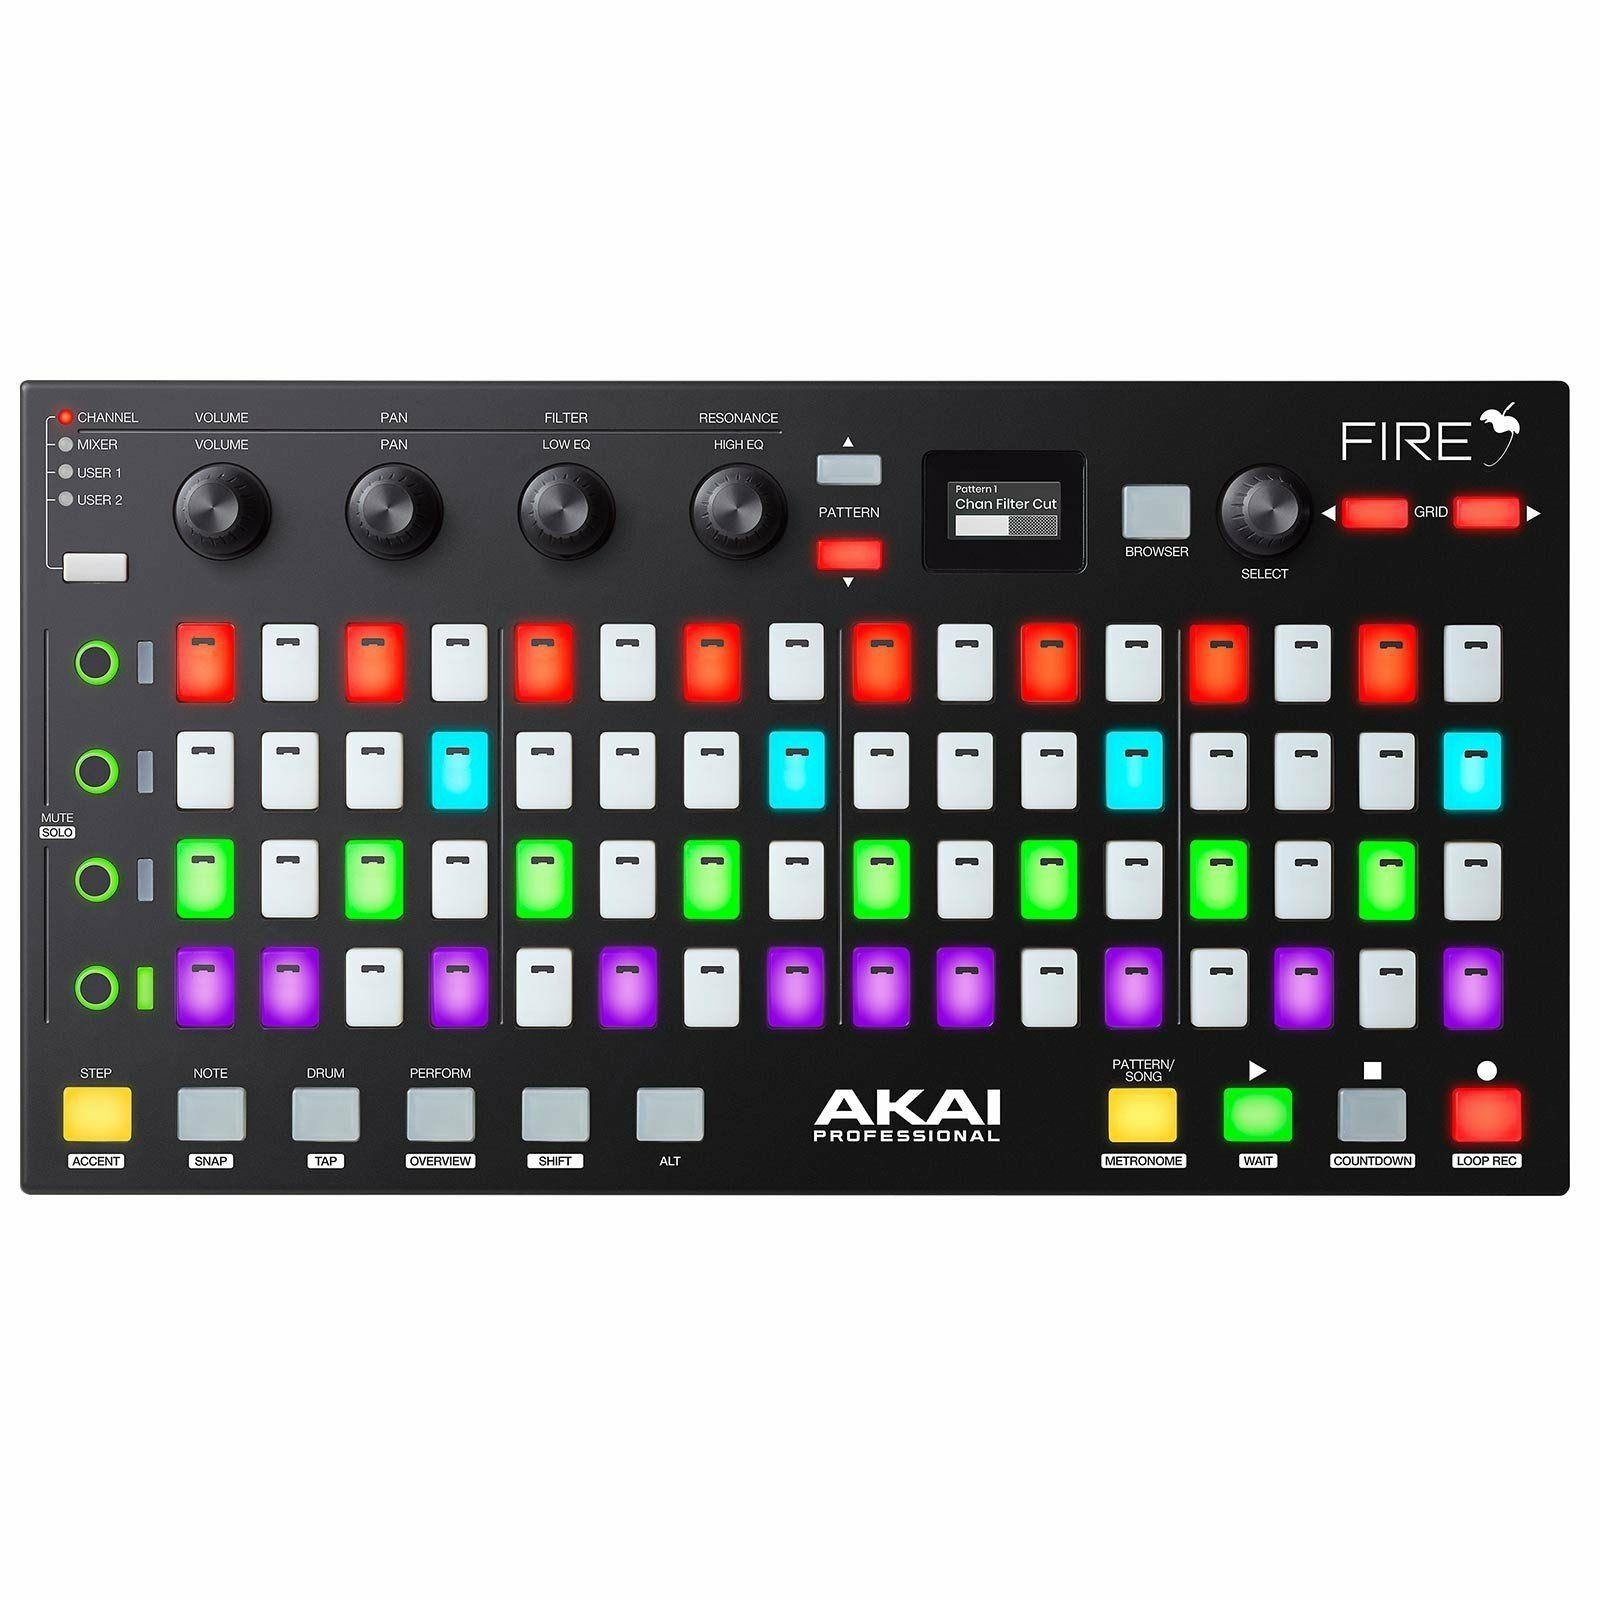 Akai Fire DAW-Controller inkl. Software (64 RGB Pads, 4 Drehregler, OLED Display)